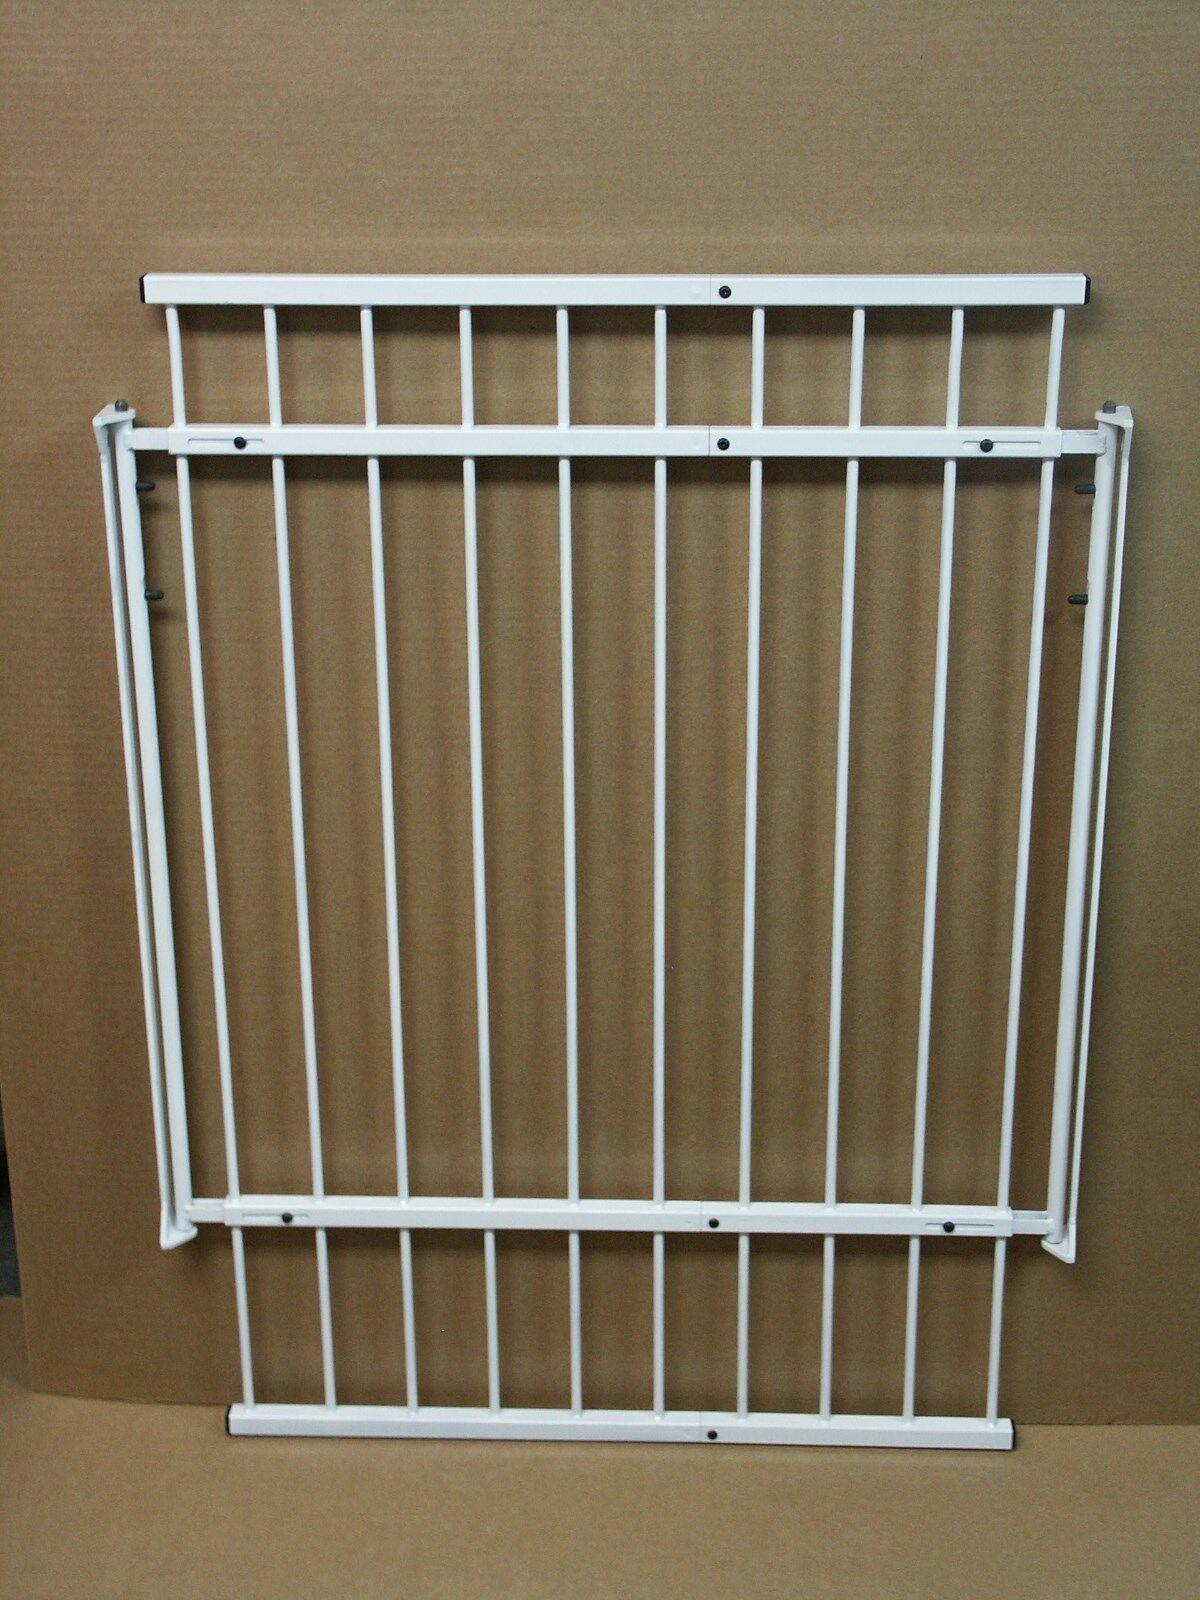 Pet Dog Gate Adjustable Width Modular Welded Steel Construction Good any Decor